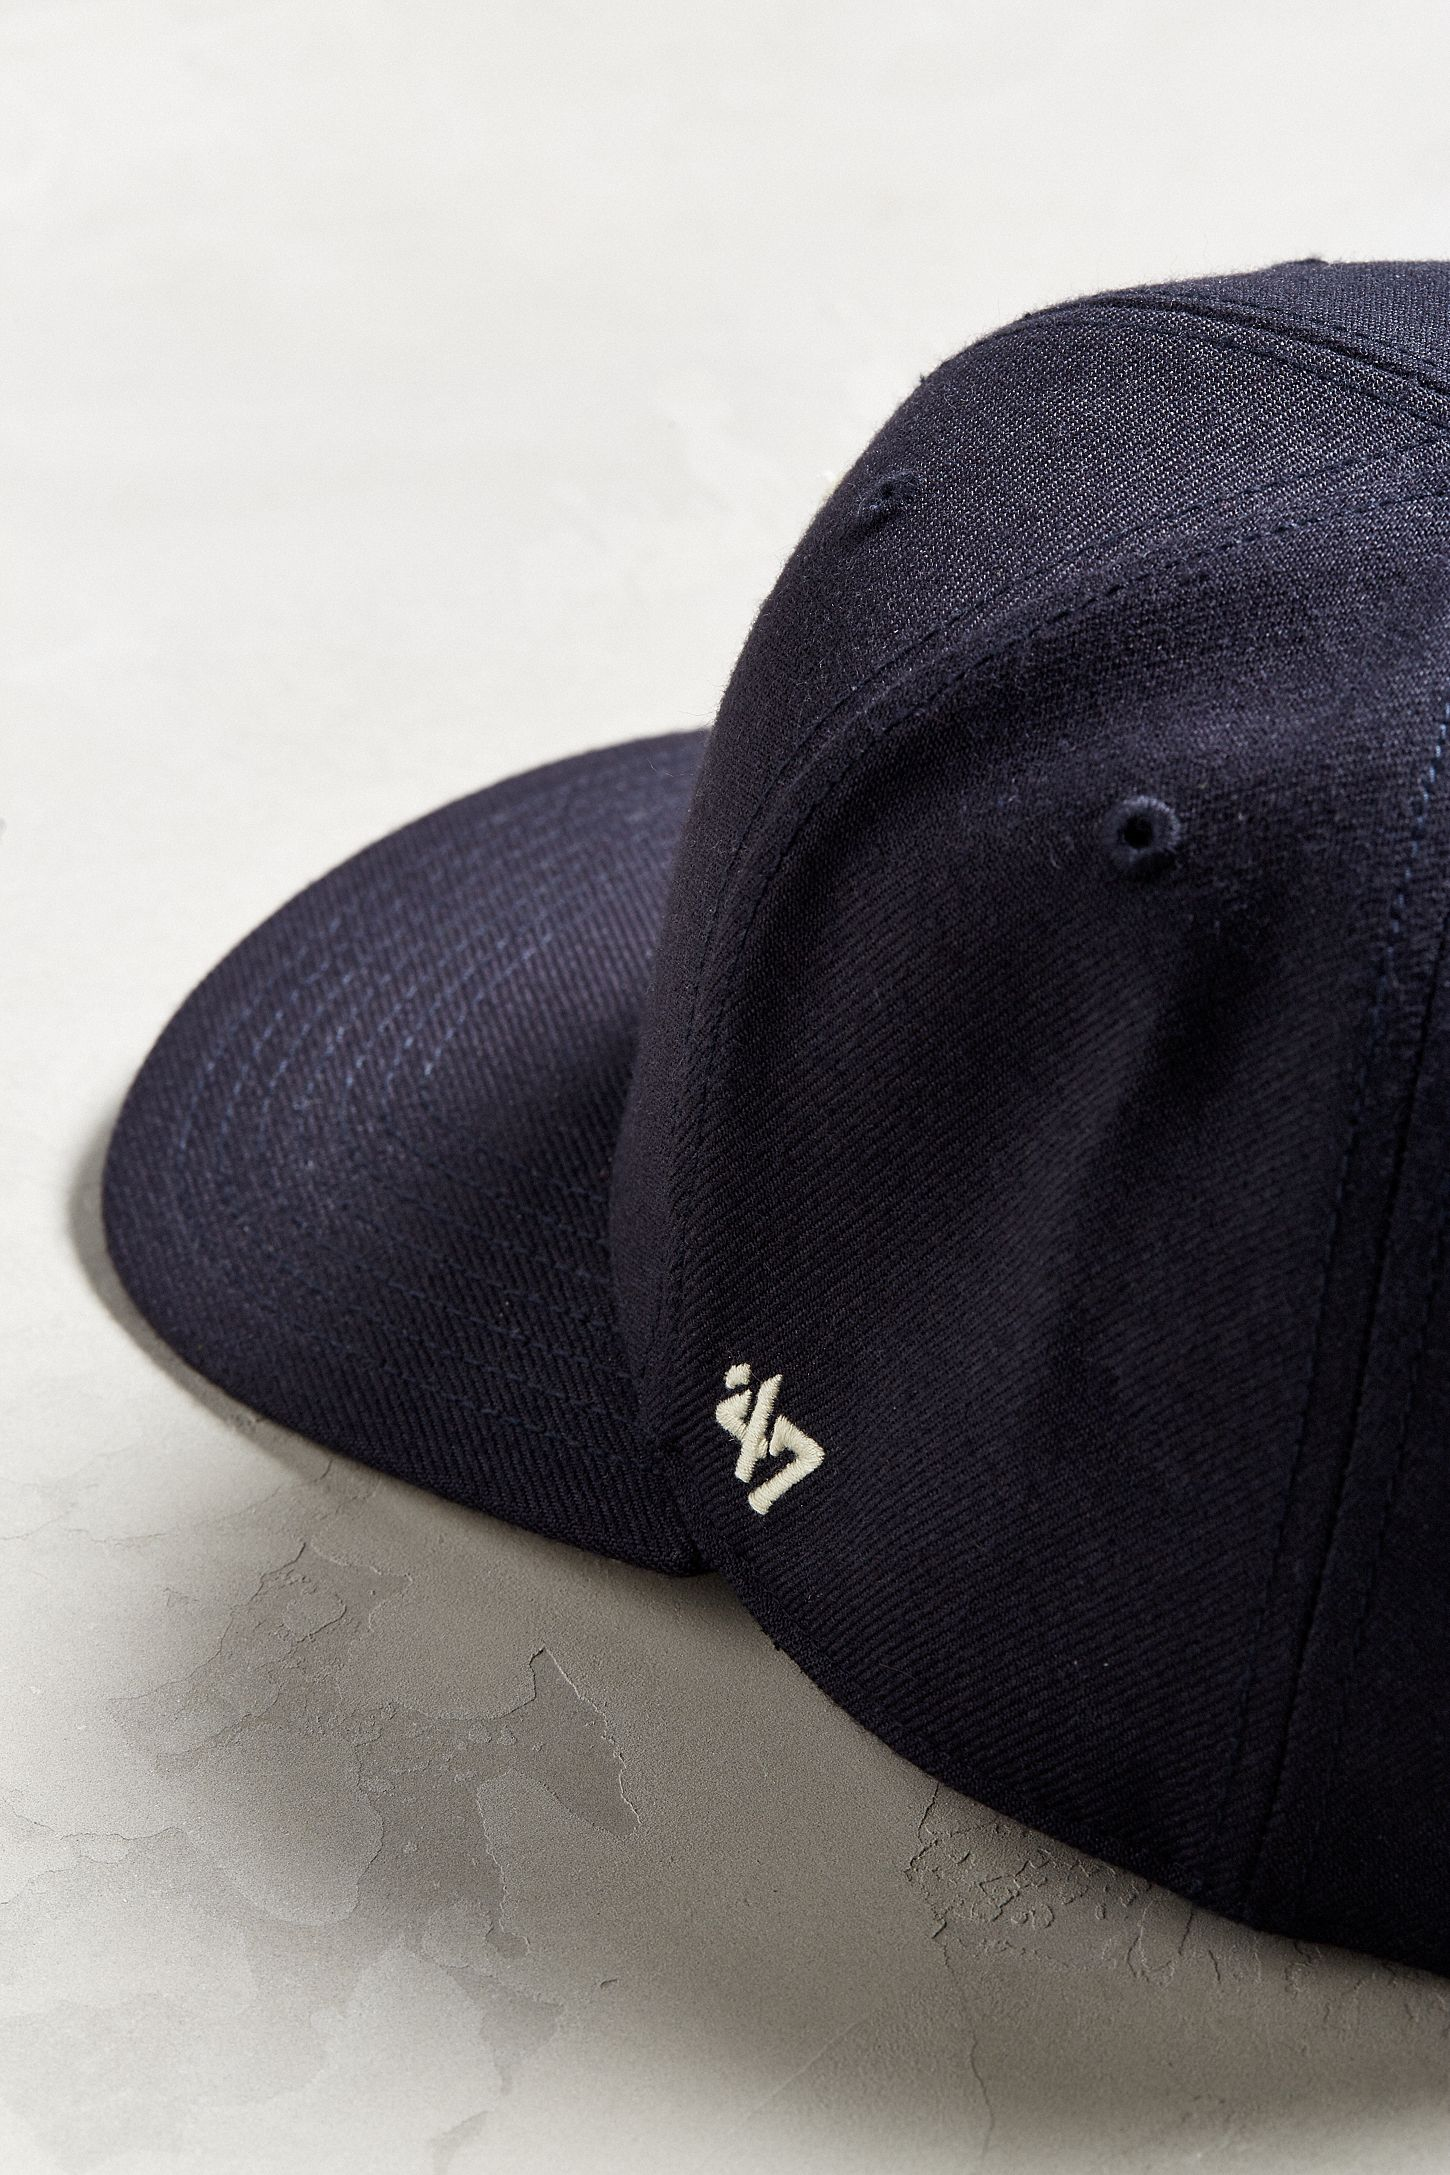 21b7dba1 authentic yankees new york hat 05303 55a0c